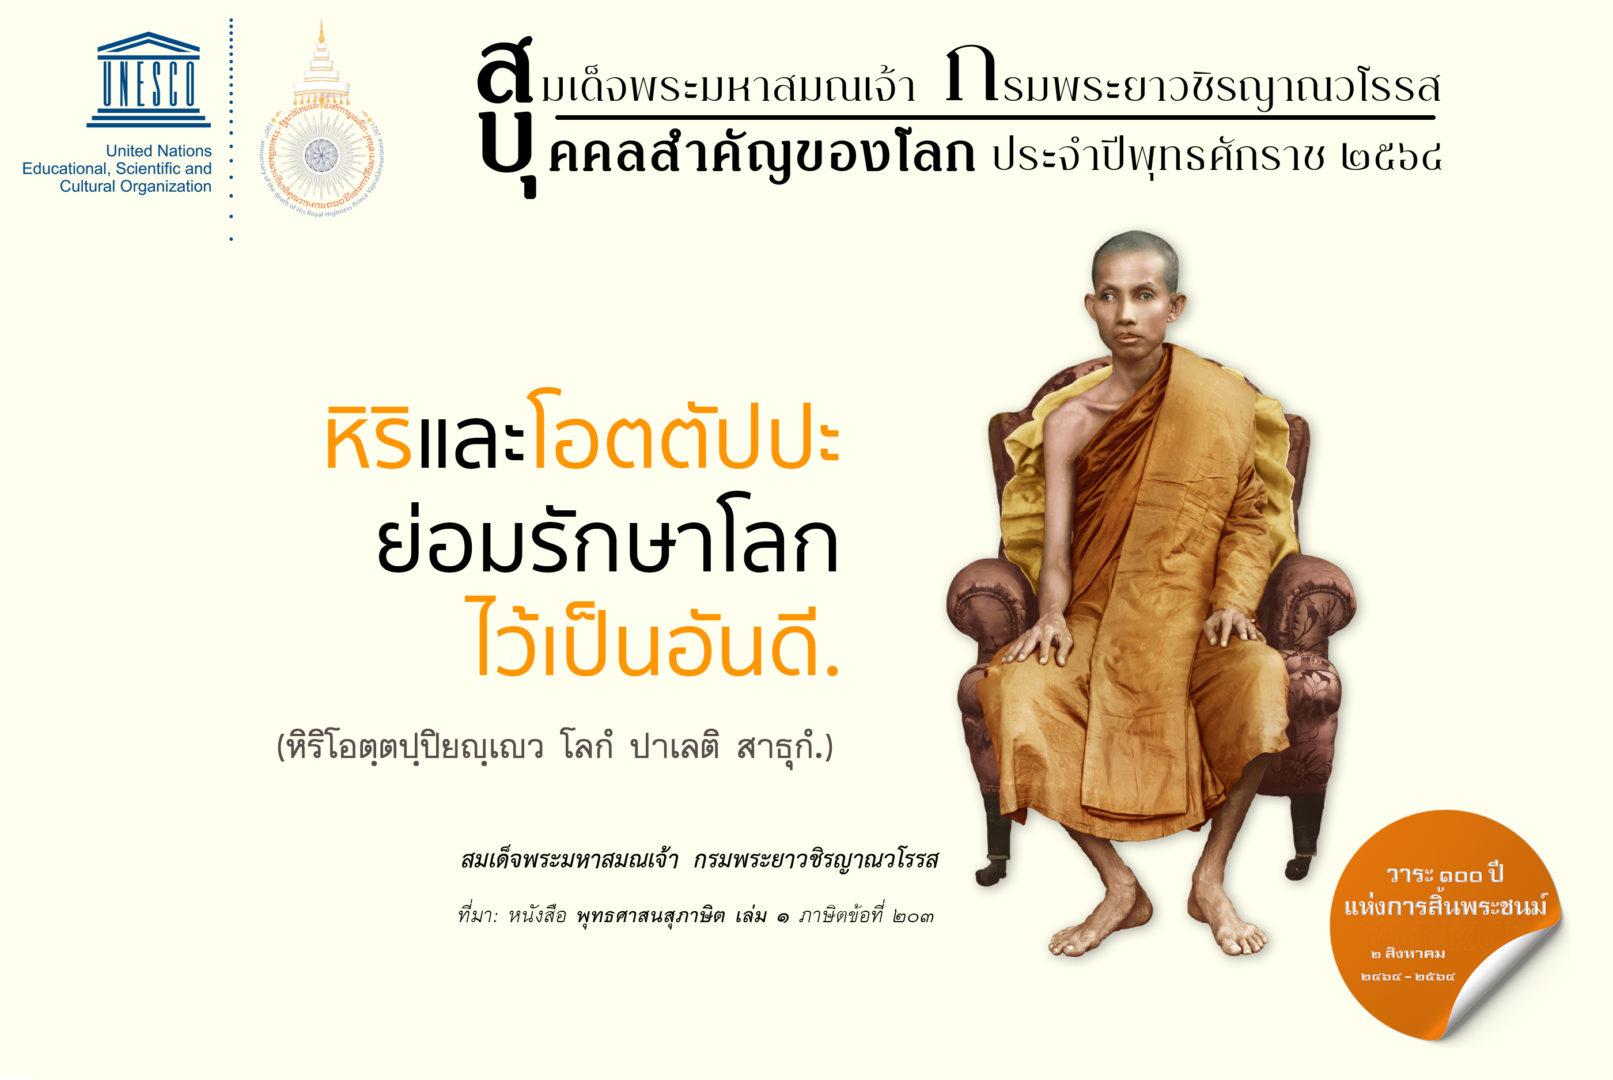 Th Mahasamana Quote 005